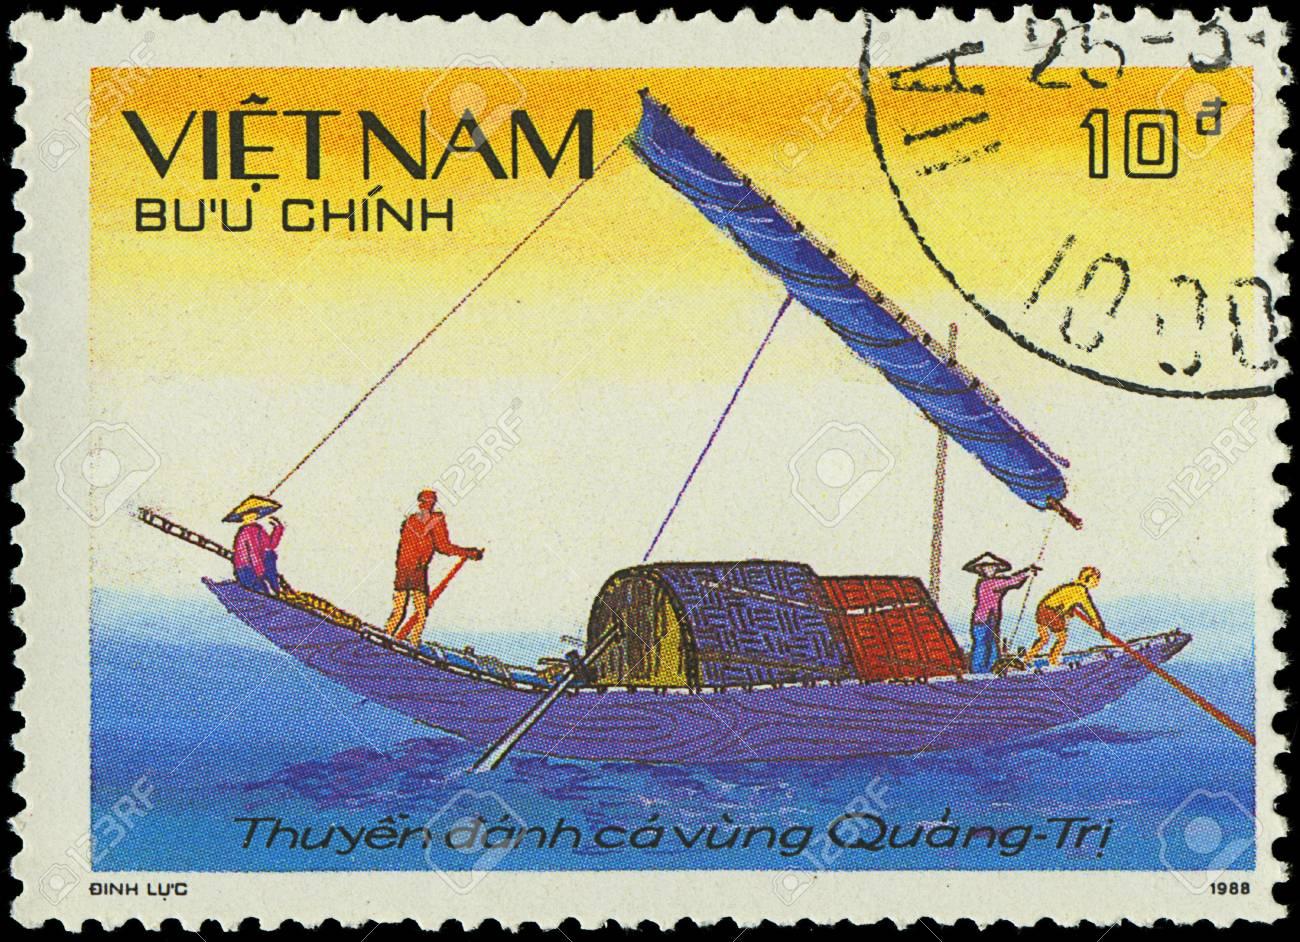 VIETNAM - CIRCA 1988  a stamp printed by VIETNAM shows image of a sailing ship, series, circa 1988 Stock Photo - 18033232